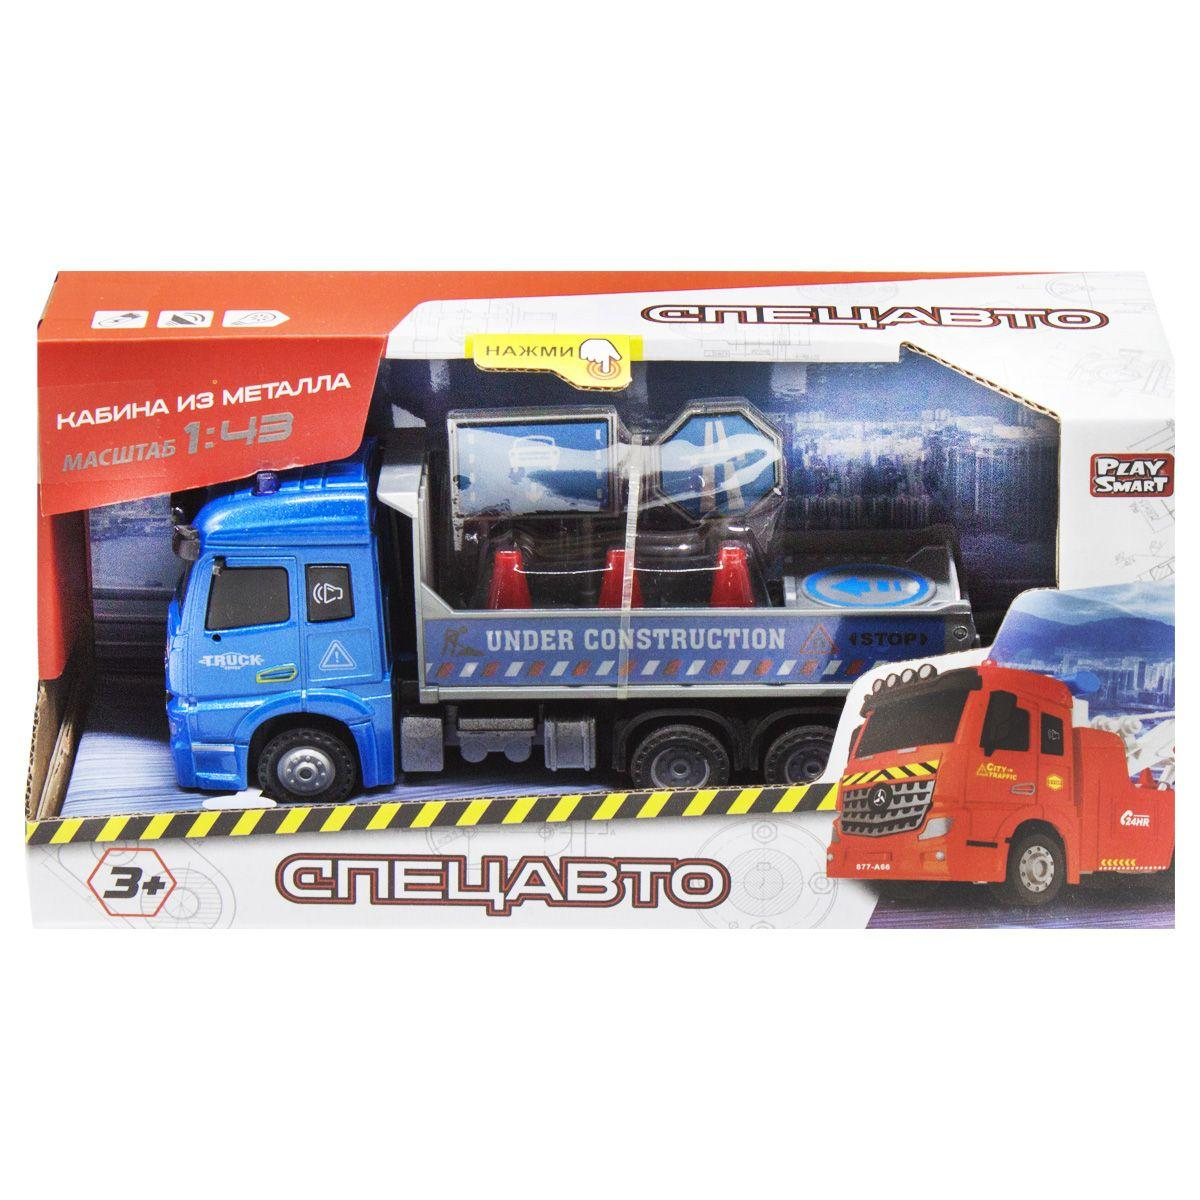 Машинка Спецавто синій MiC (6693)